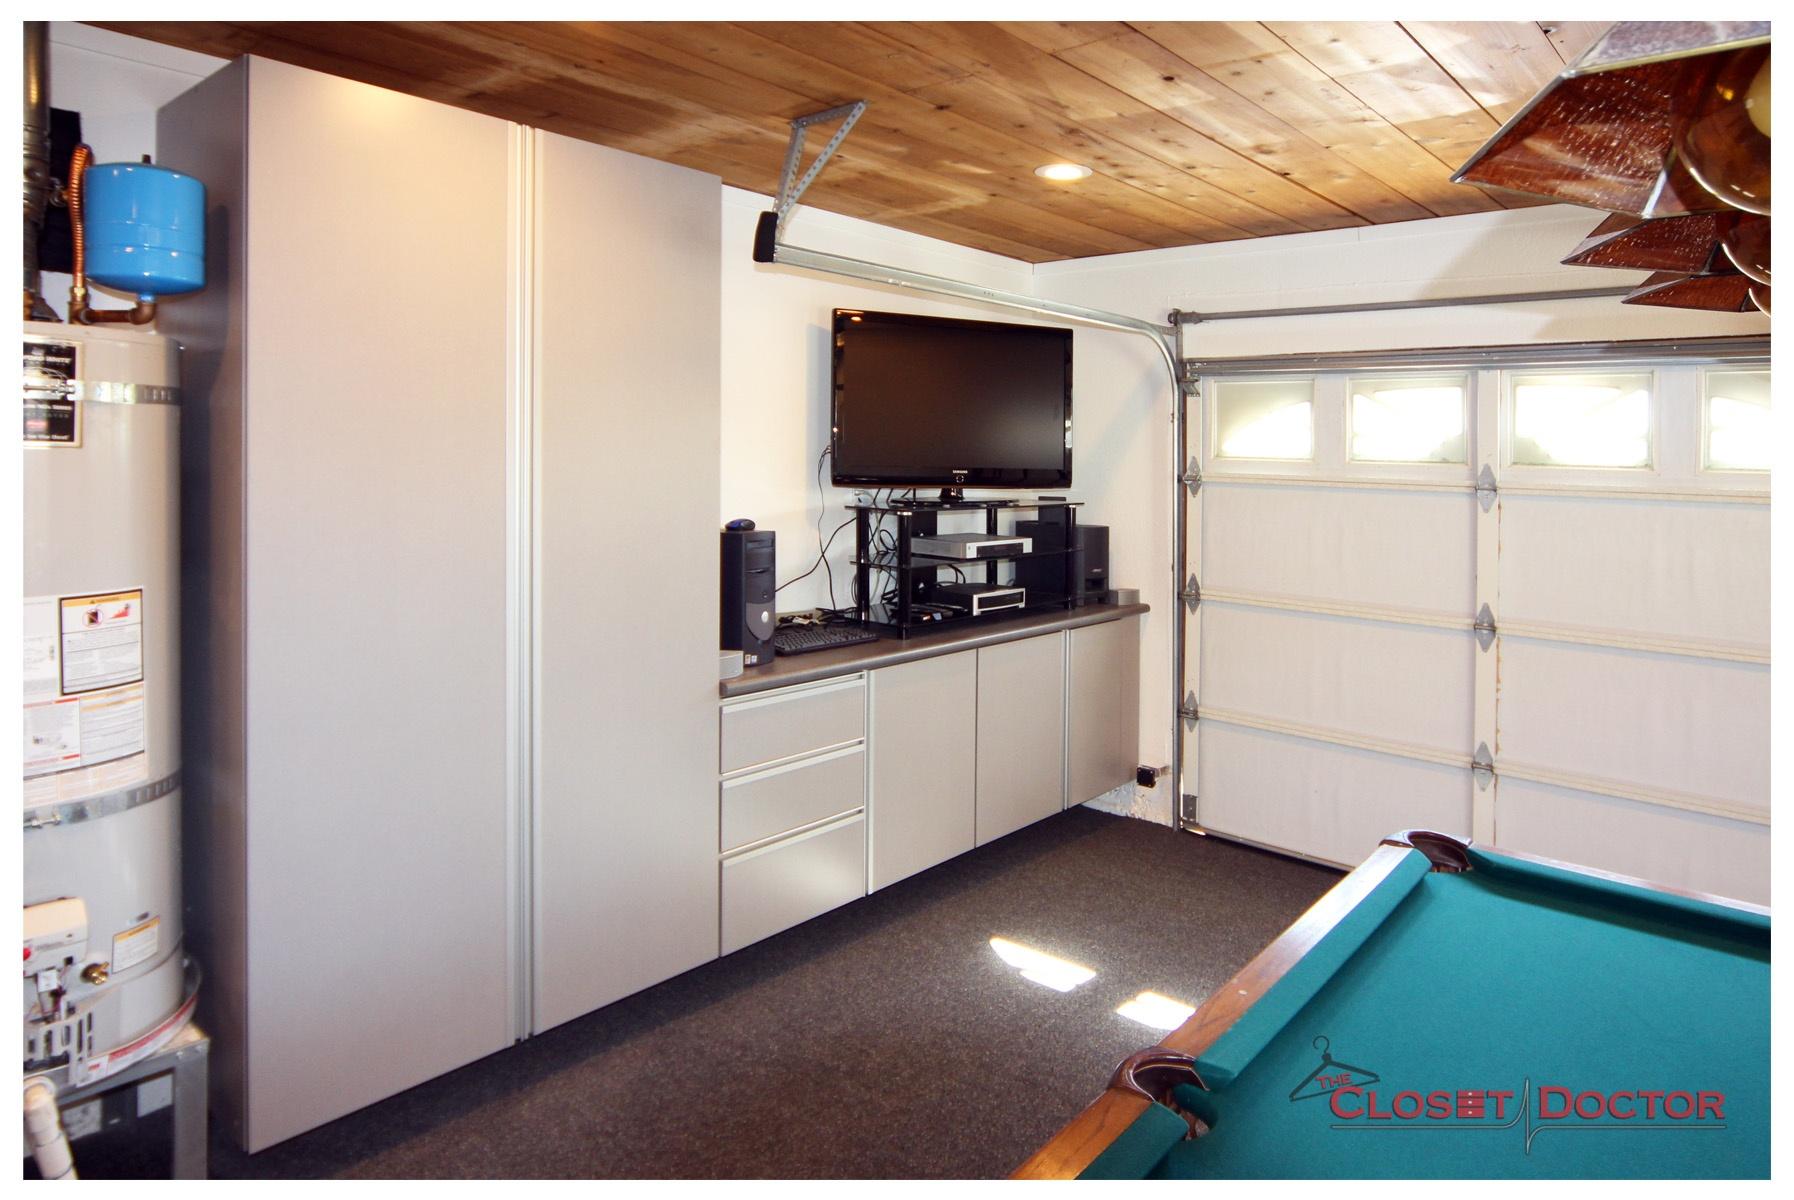 20-custom-garage-cabinets-the-closet-doctor-lincoln-roseville-sacramento-Hillier.jpg